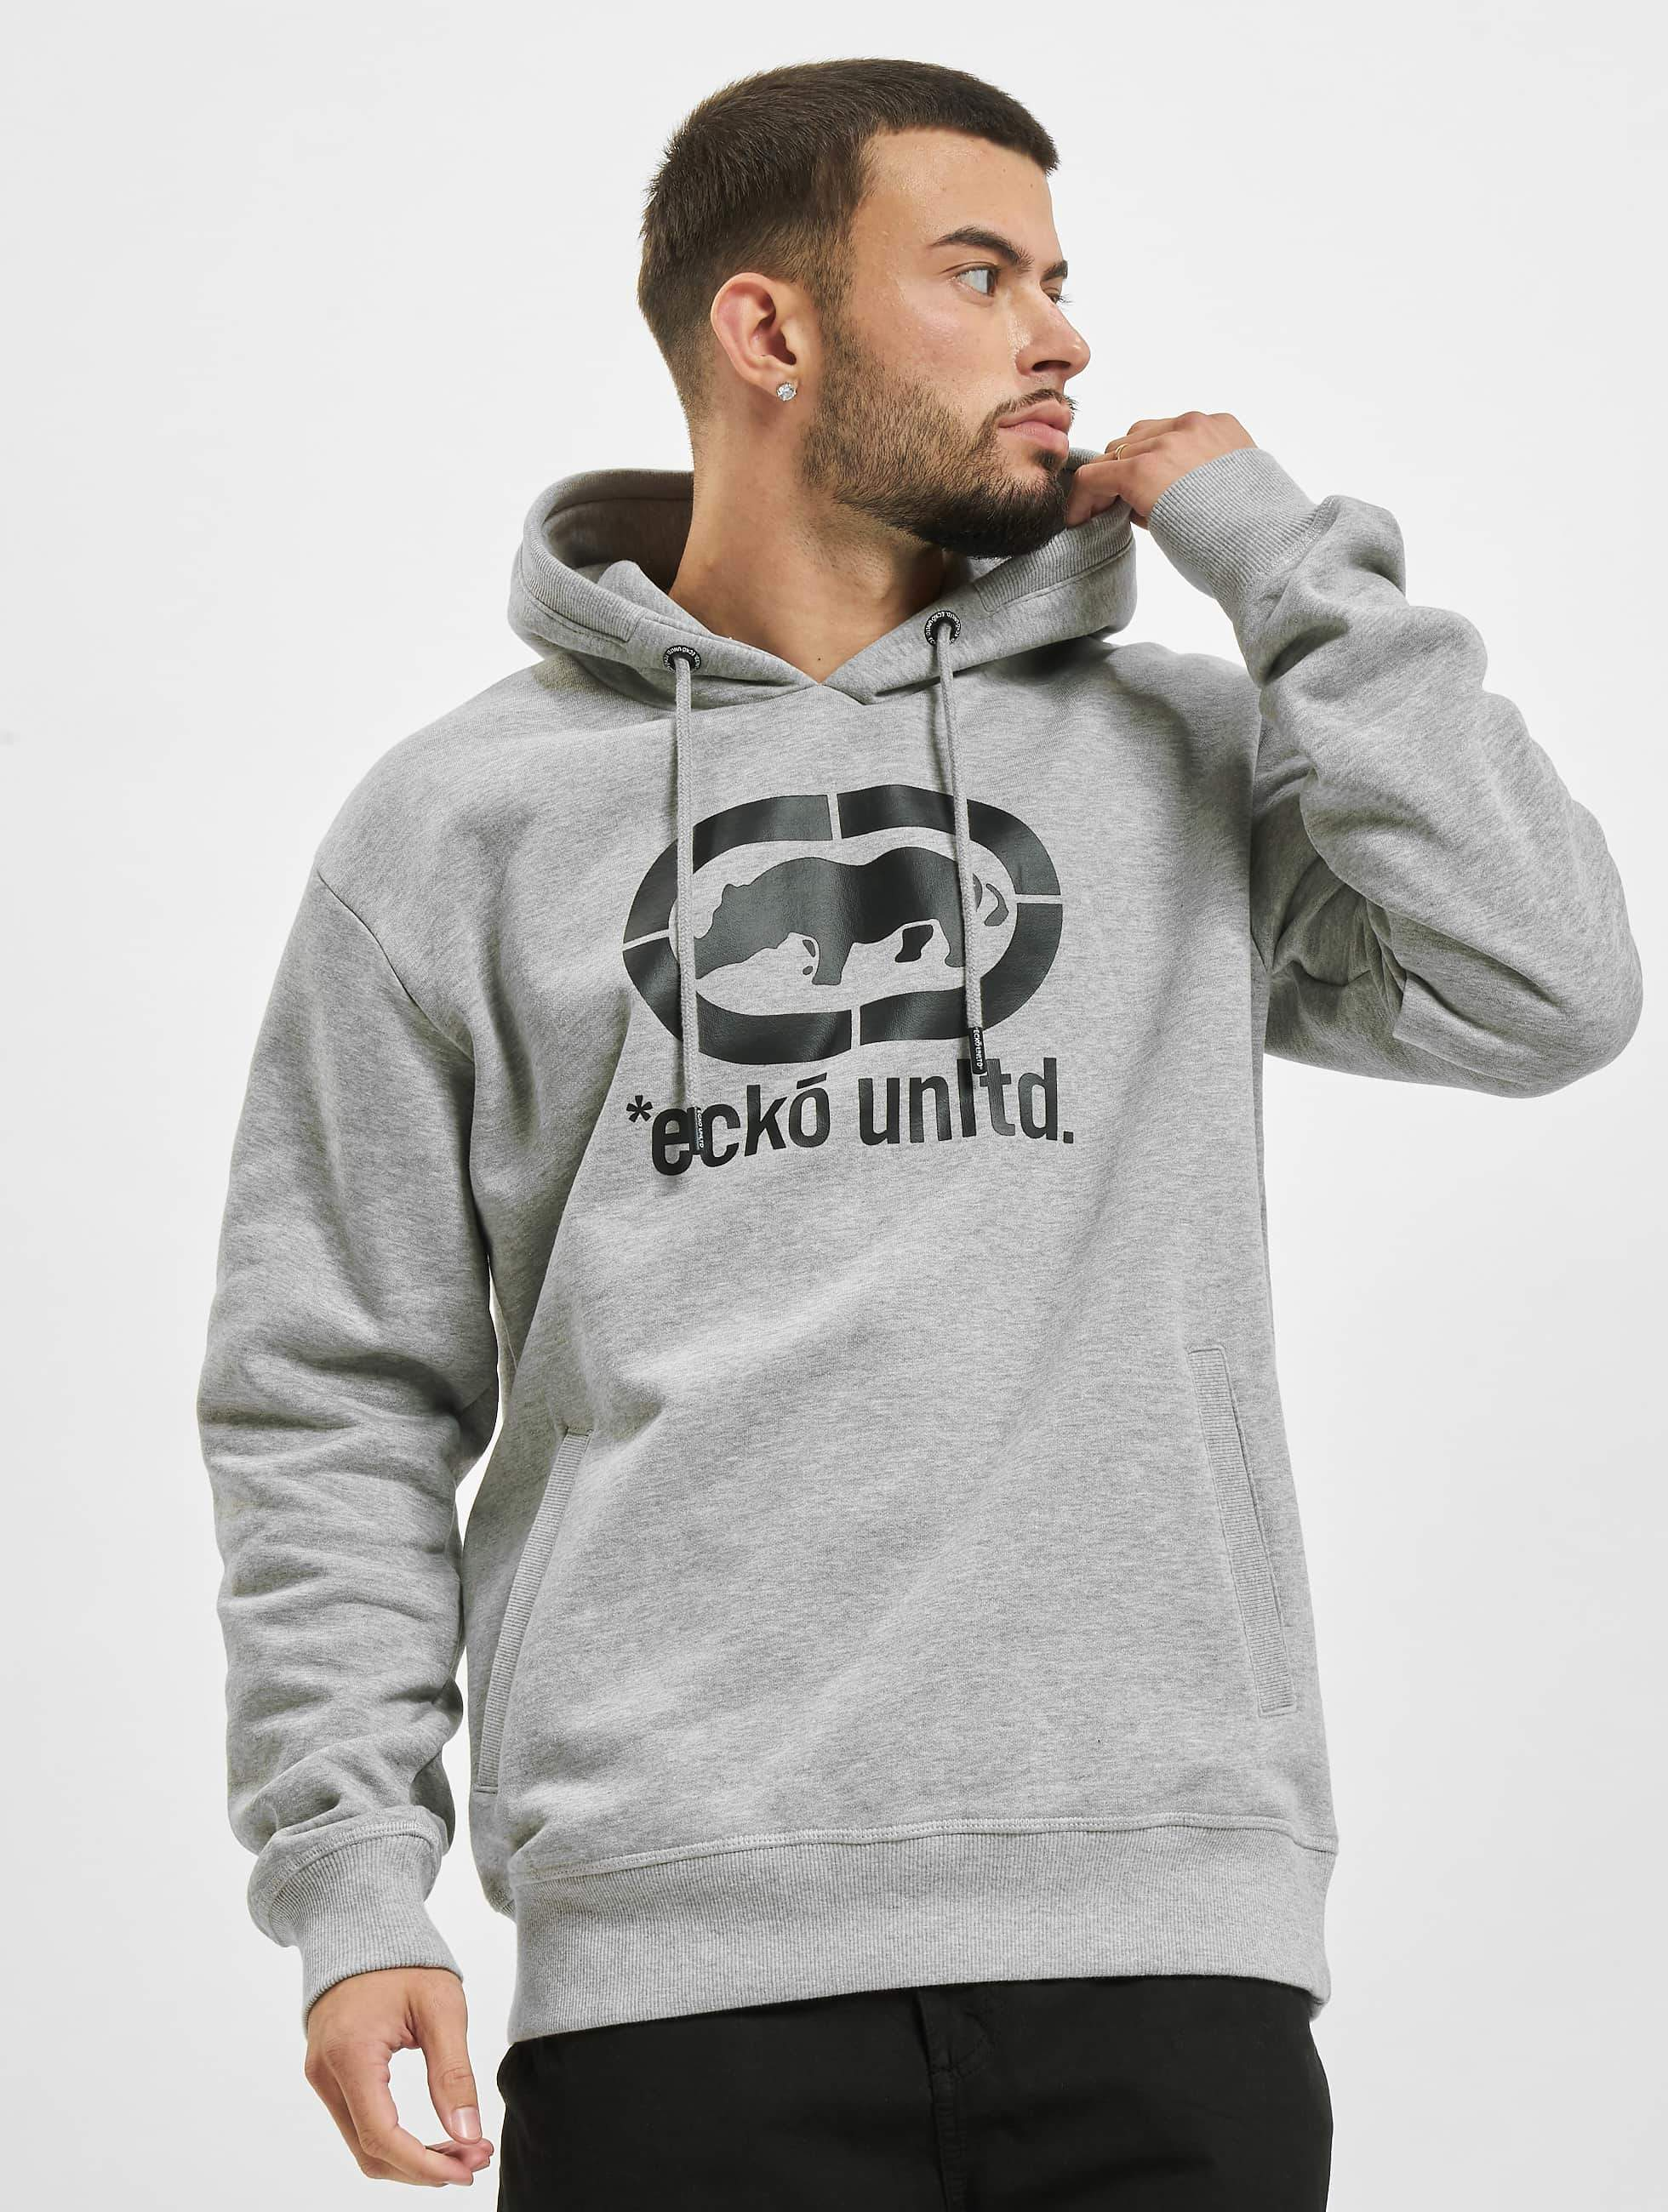 Ecko Unltd. / Hoodie Base in grey M